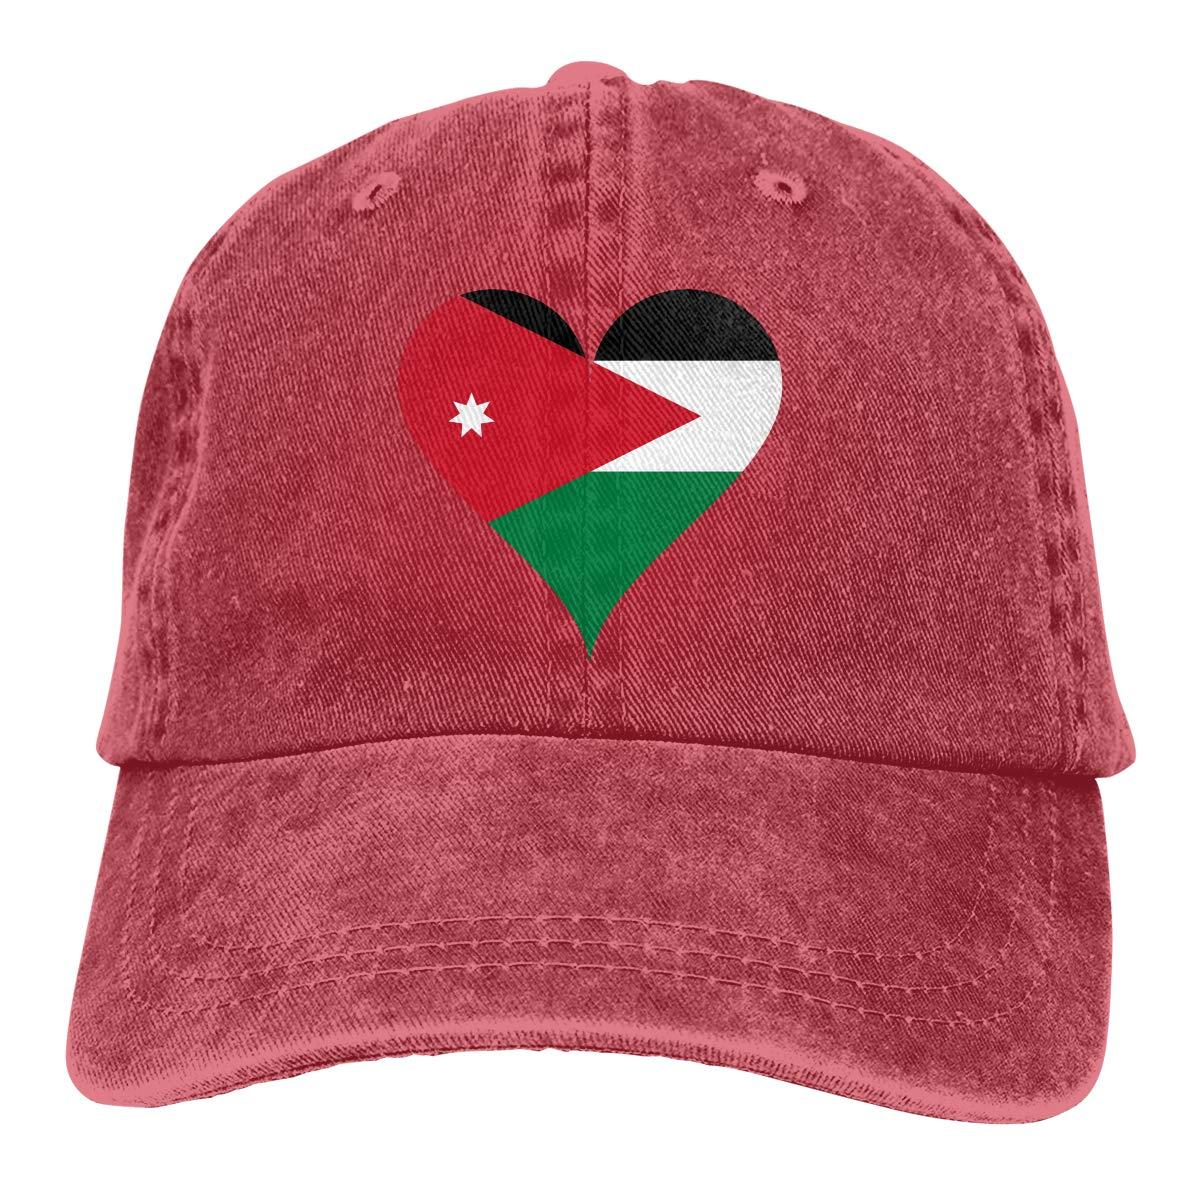 Amazon.com  Unisex Heart Love Affection Jordan Flag Vintage Chic Denim  Adjustable Dad Hats Baseball Cap Black  Clothing 165084b3f27